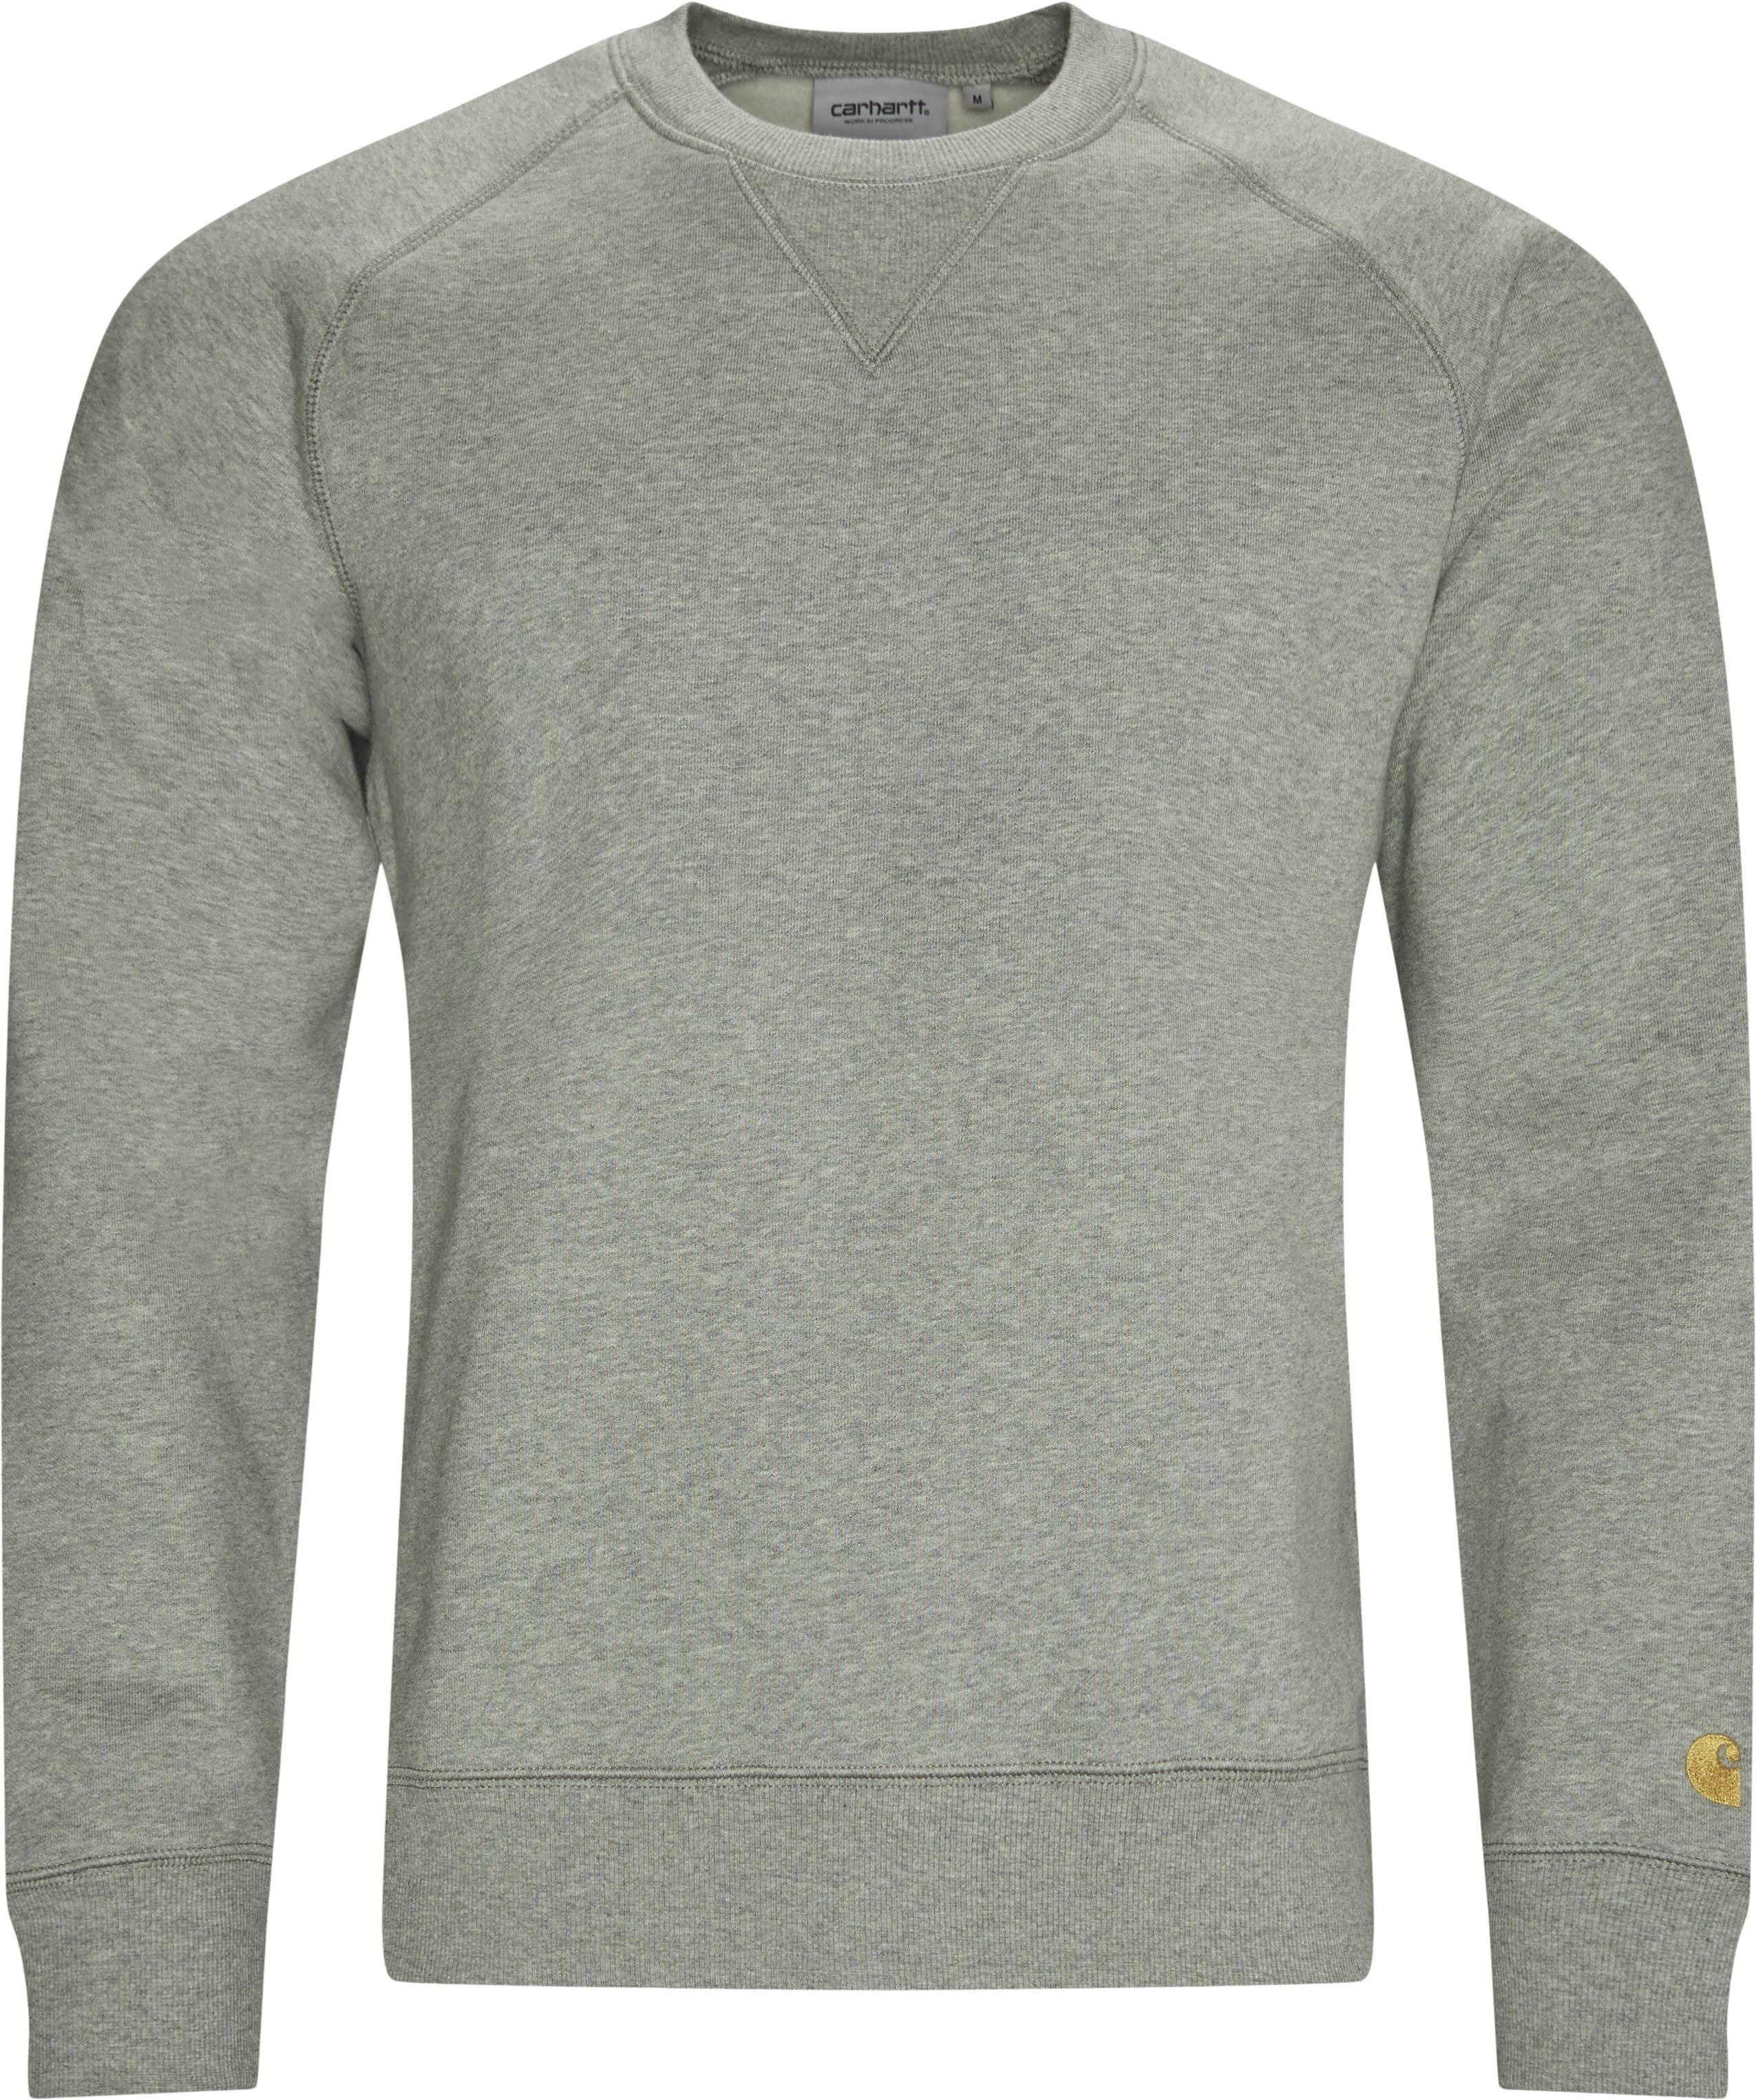 Crew Chase Sweatshirt - Sweatshirts - Regular fit - Grå